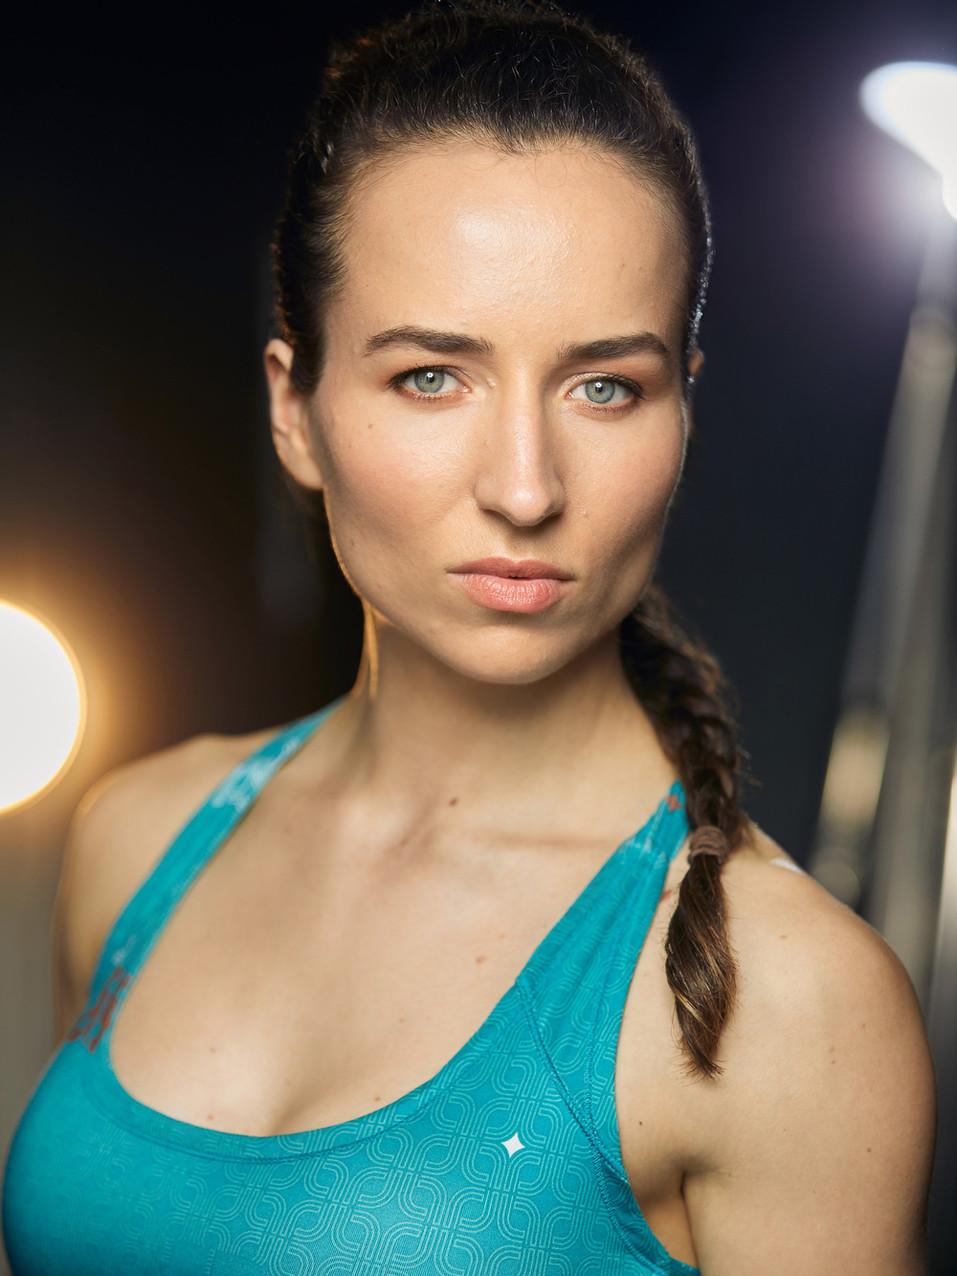 SamanthaSchnitzler_Headshot